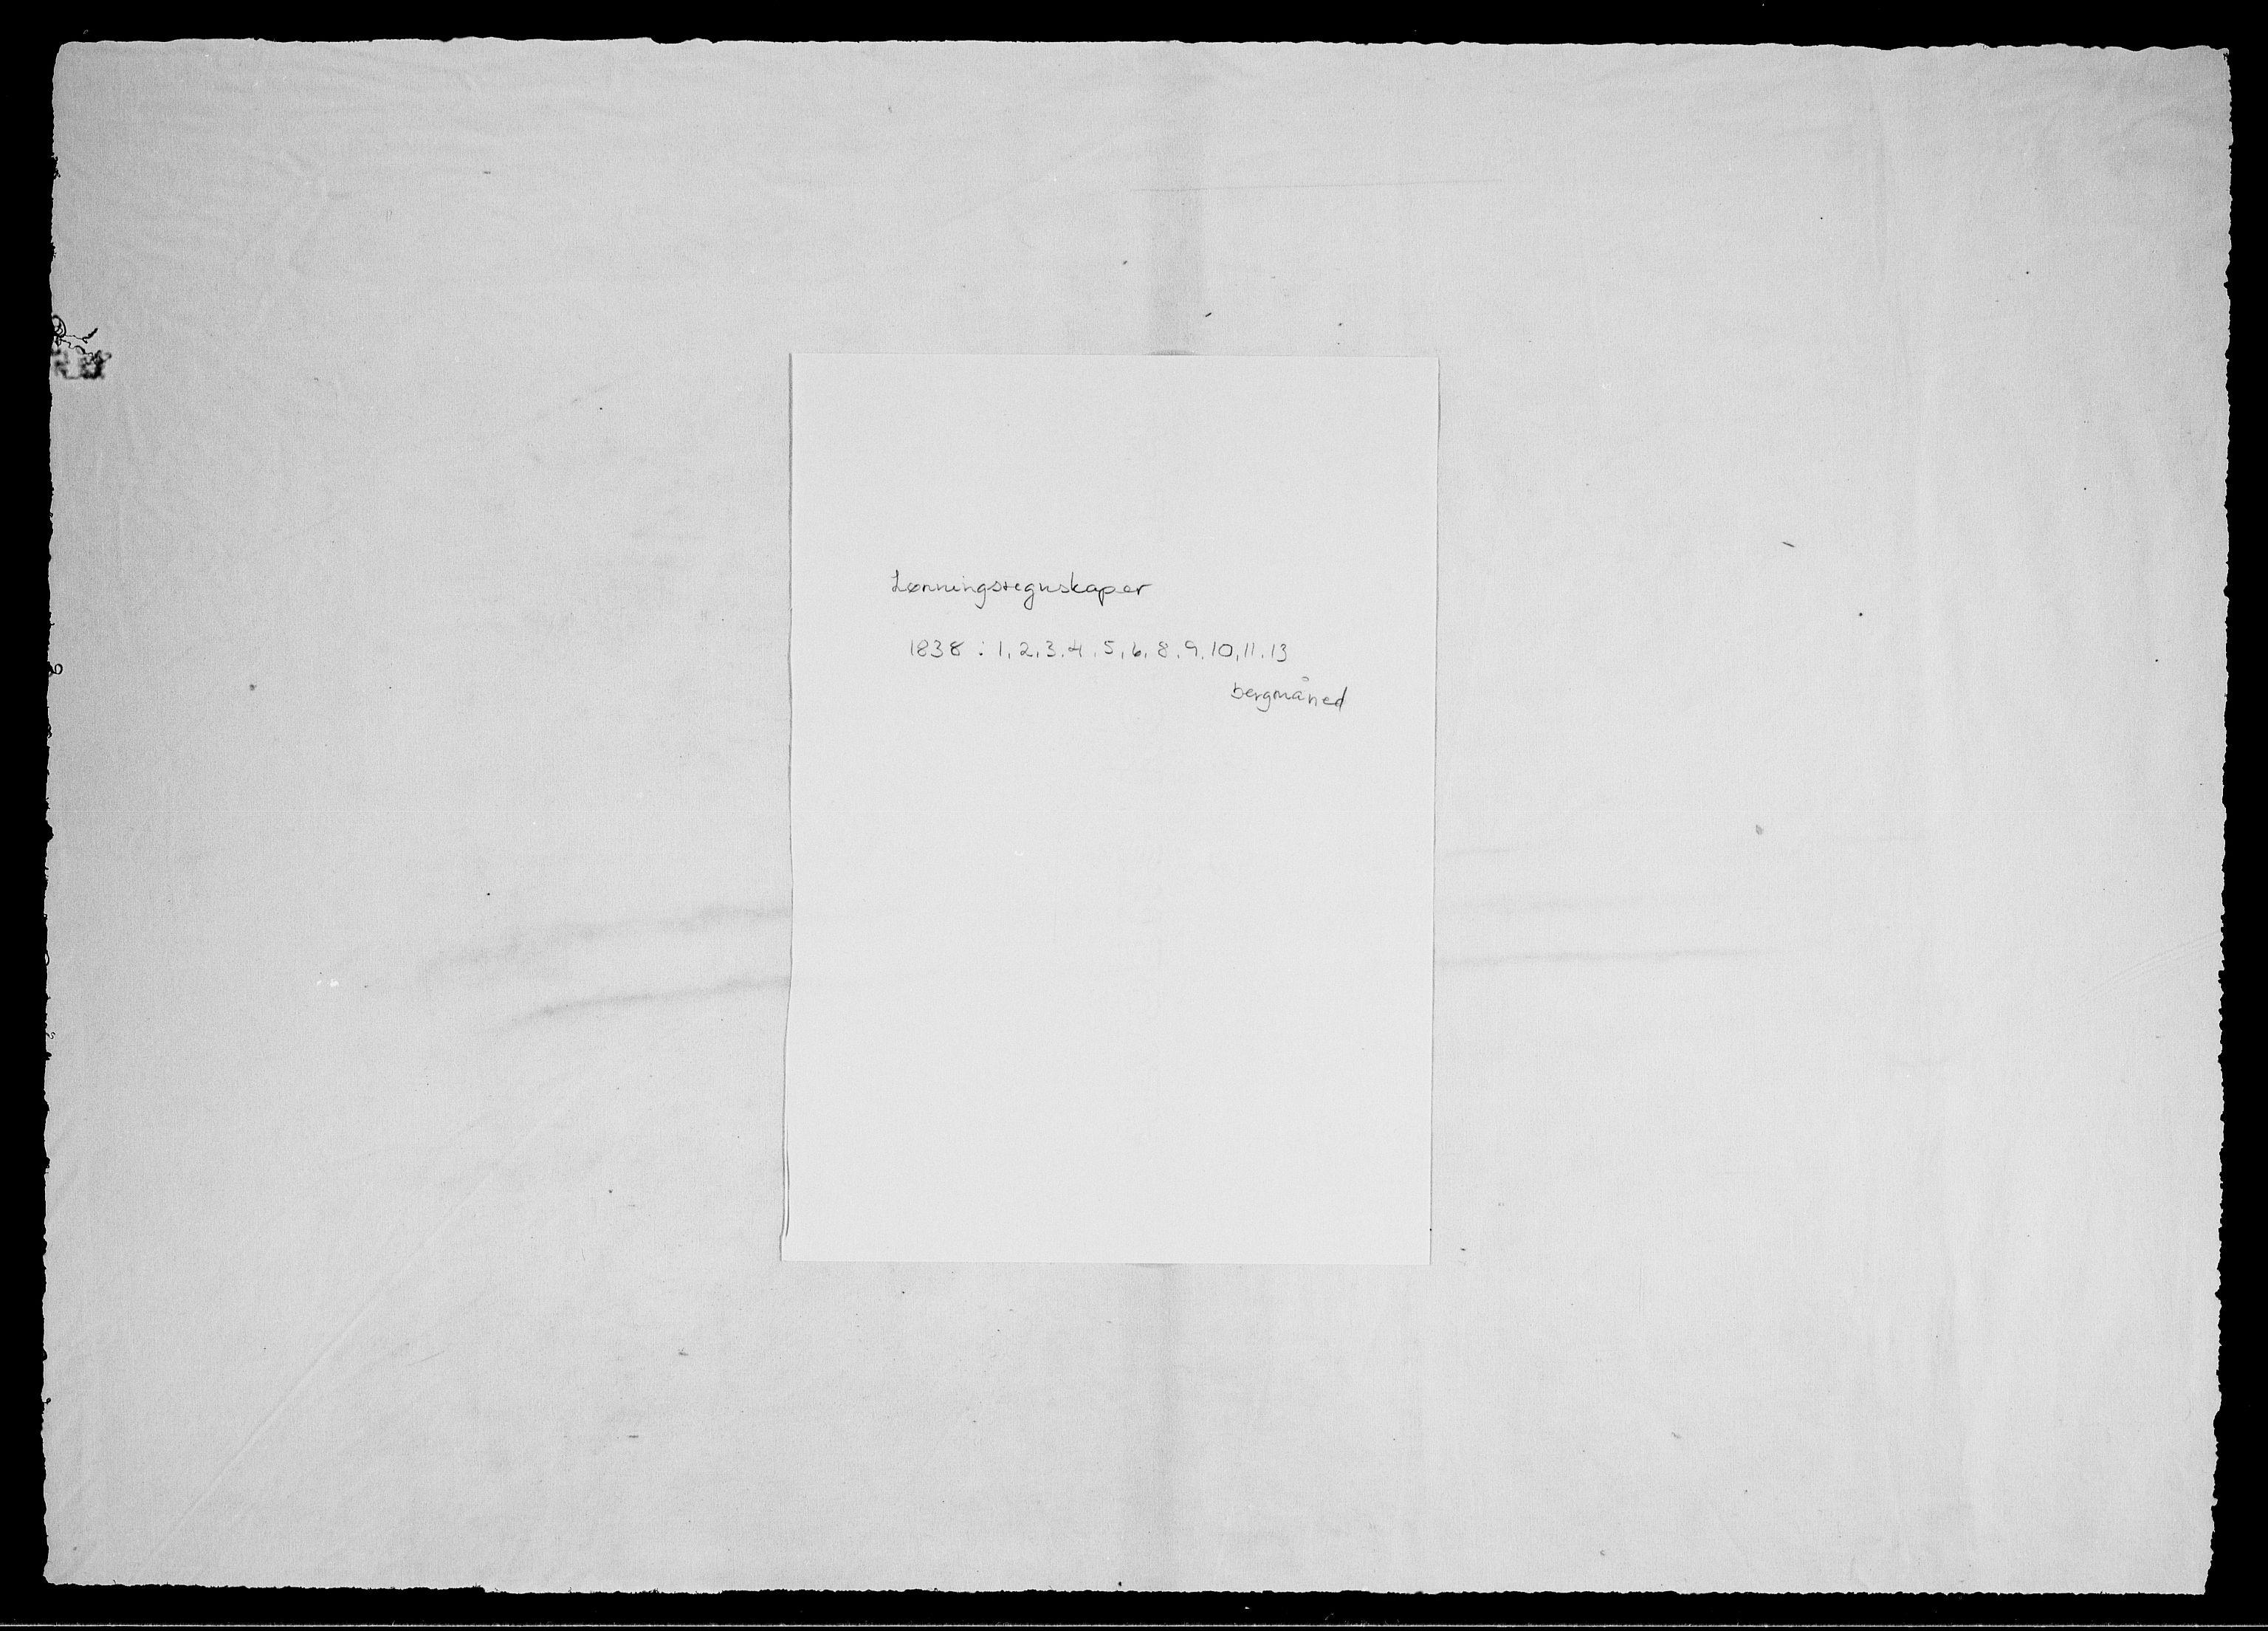 RA, Modums Blaafarveværk, G/Gd/Gdd/L0277, 1838, s. 2